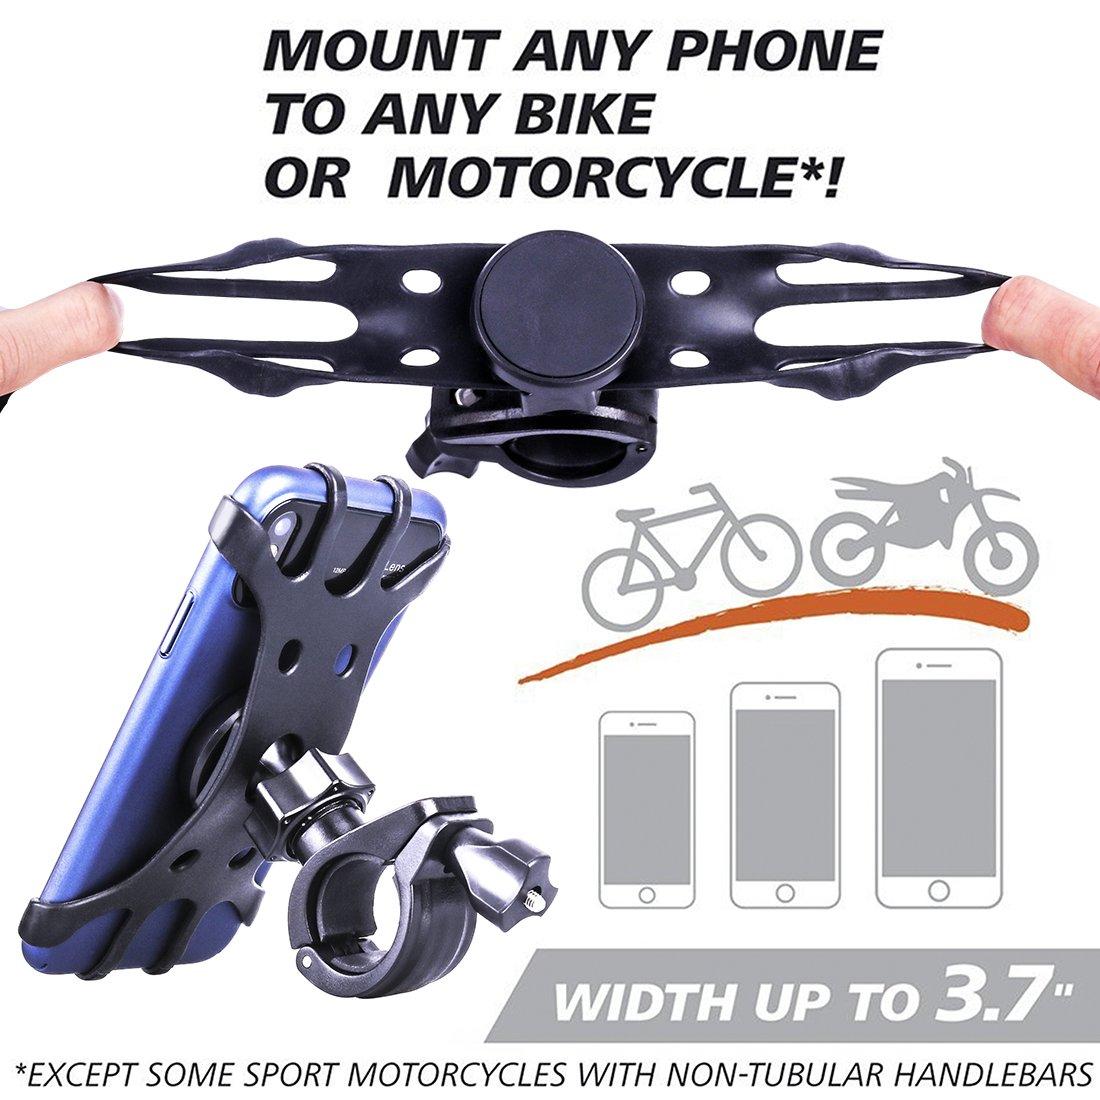 Bike Phone Holder Samsung Galaxy S9//S8 Plus 4-6.5 Phones Bicycle Phone Holder Anti Shake Motorcycle Handlebar Mount with 360 /° Rotation Adjustable Bike Phone Mount for iPhone X//6//7//8 Plus GPS 4-6.5 Phones MZDWK 4351560202